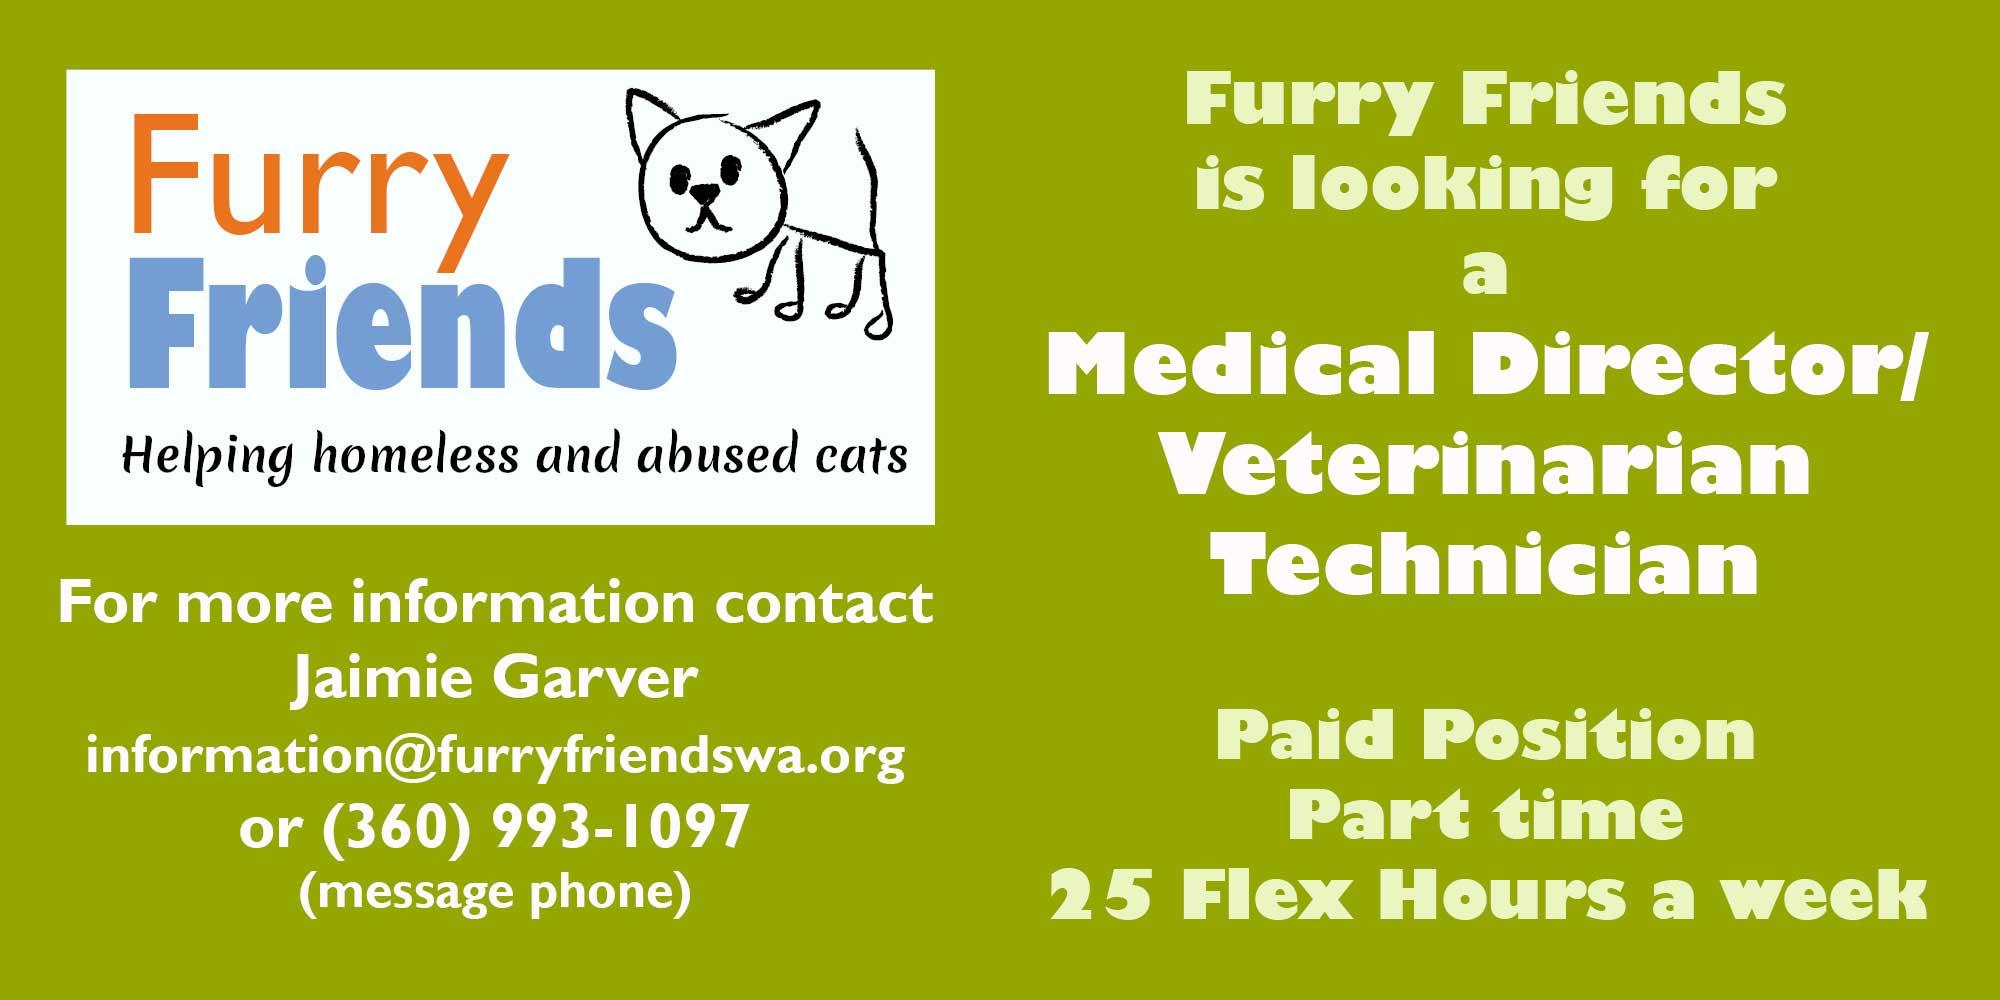 Medical Director/Veterinarian Technician Wanted